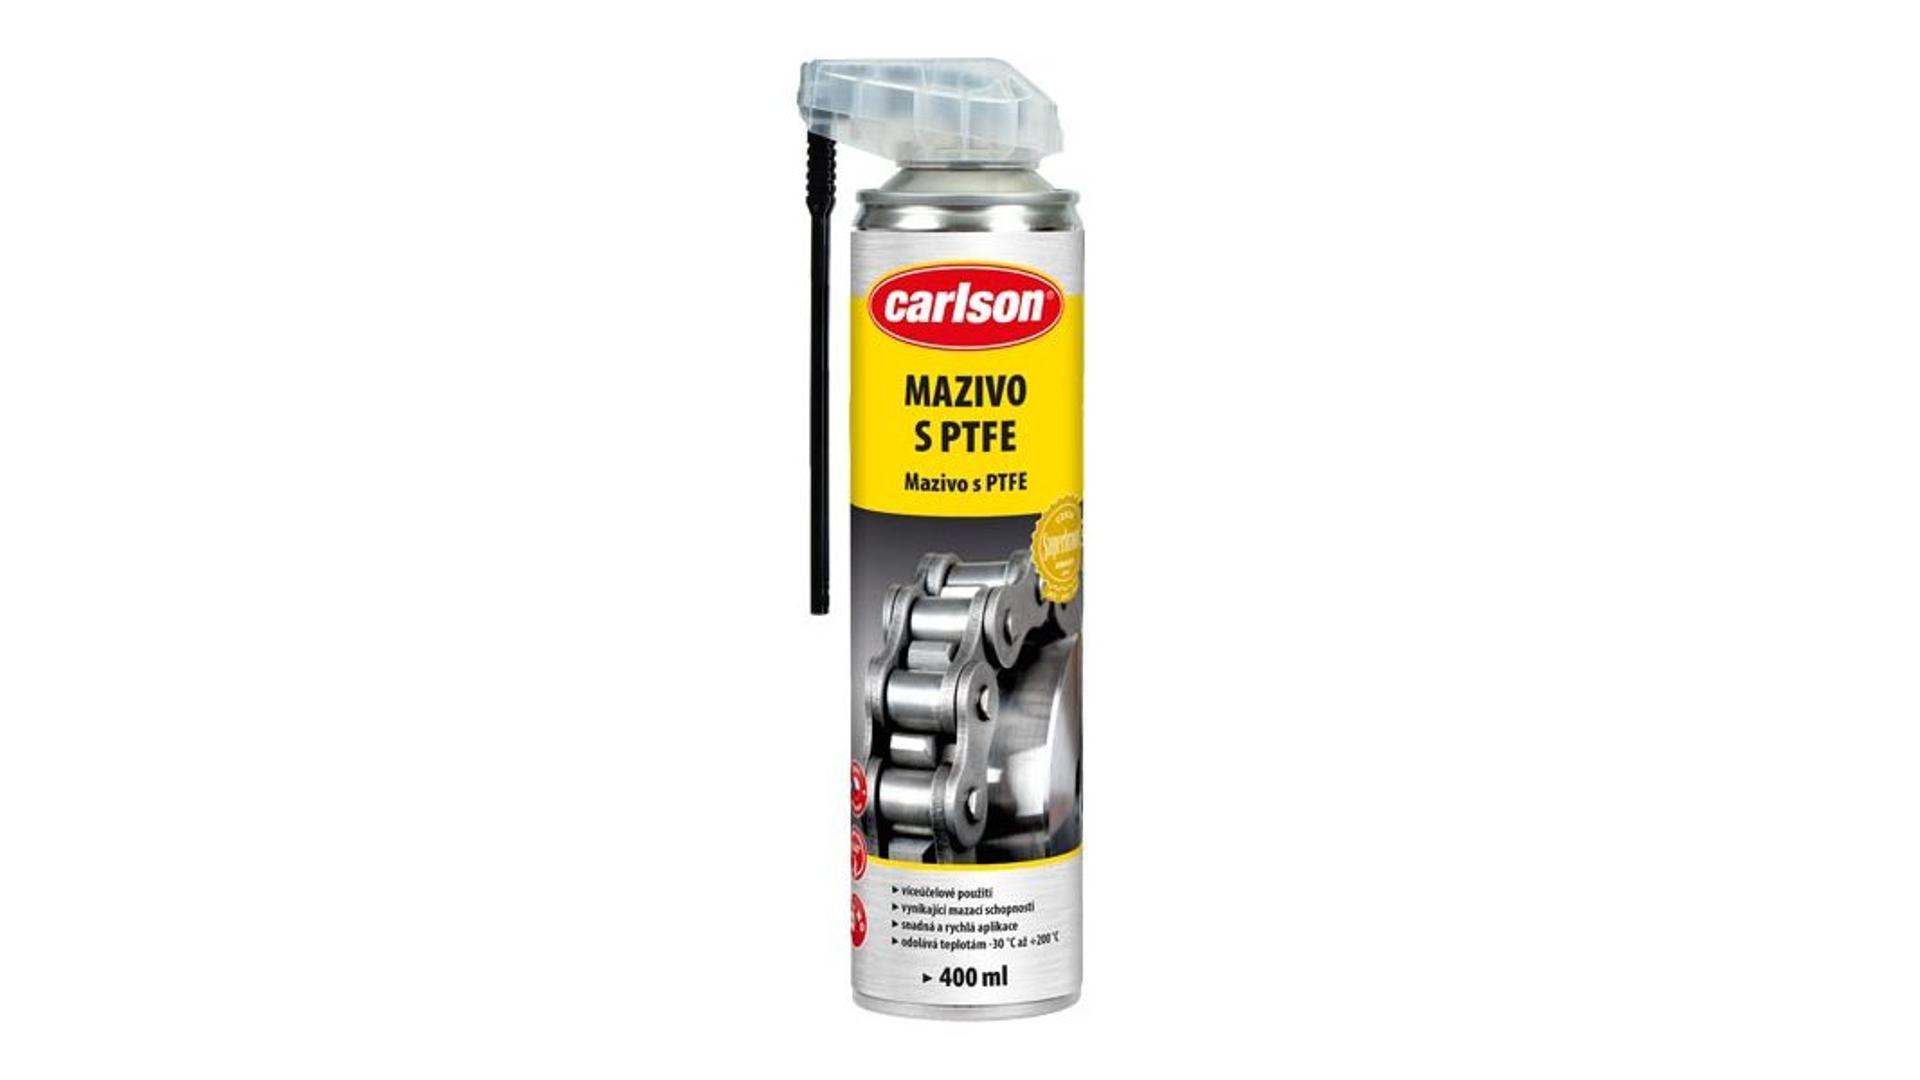 CARLSON MAZIVO S PFTE - AEROSOL